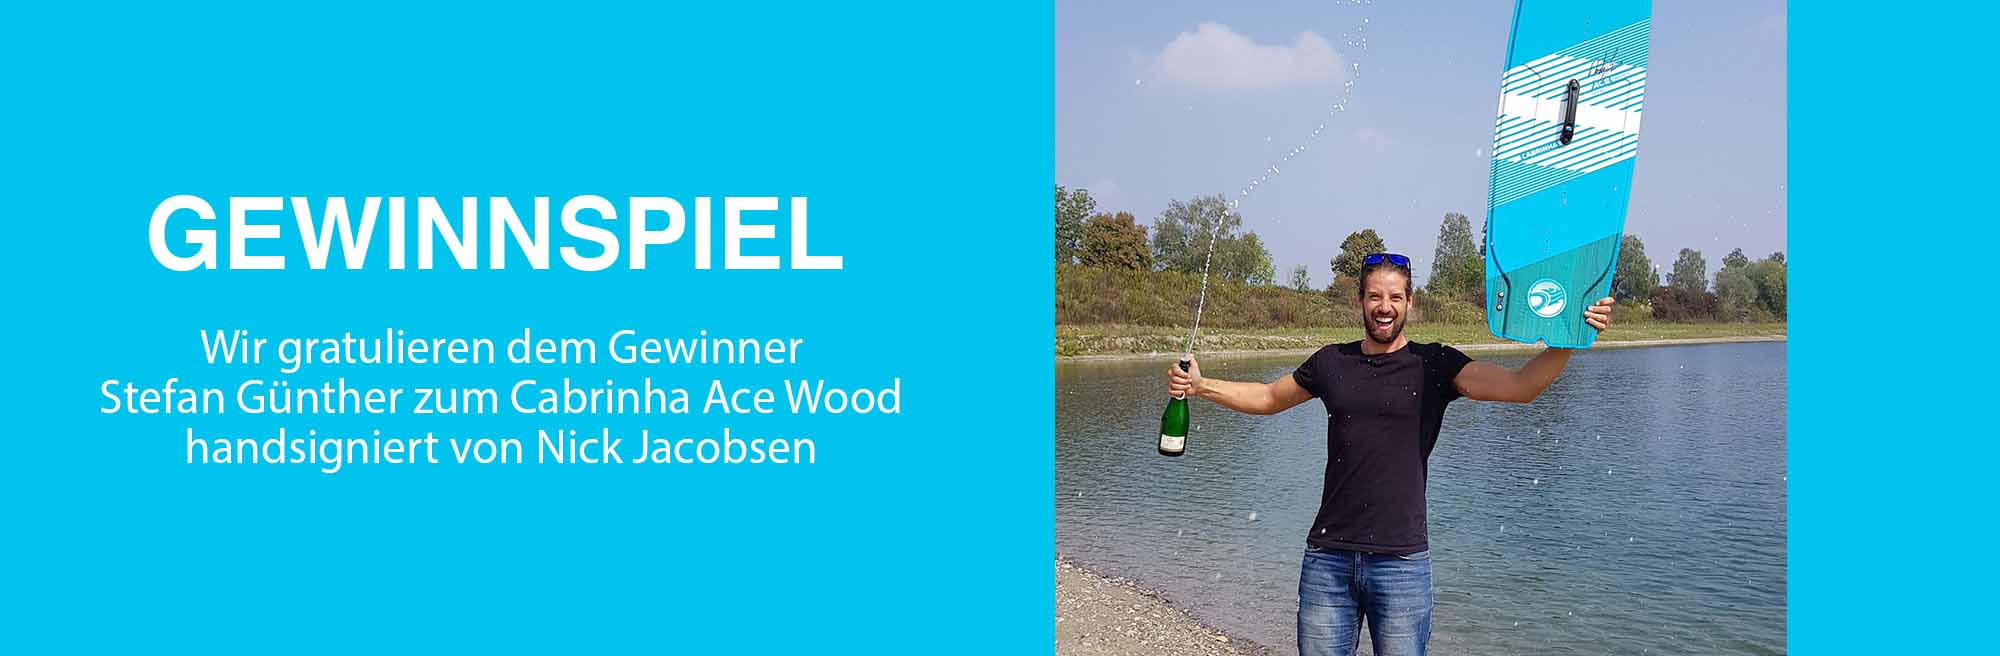 Gewinner Cabrinha Ace Wood